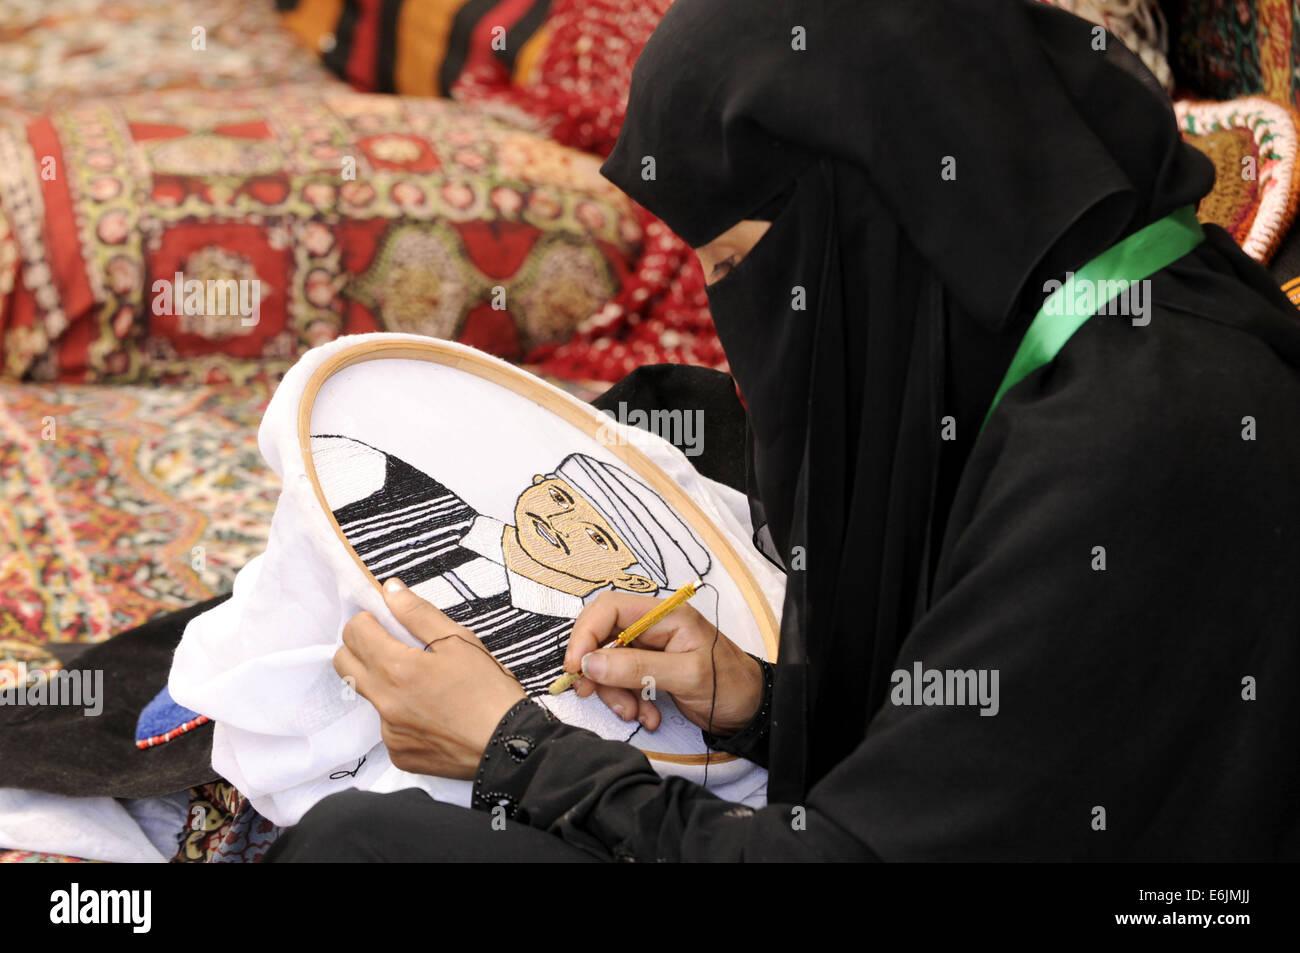 Arabo adolescenza micio